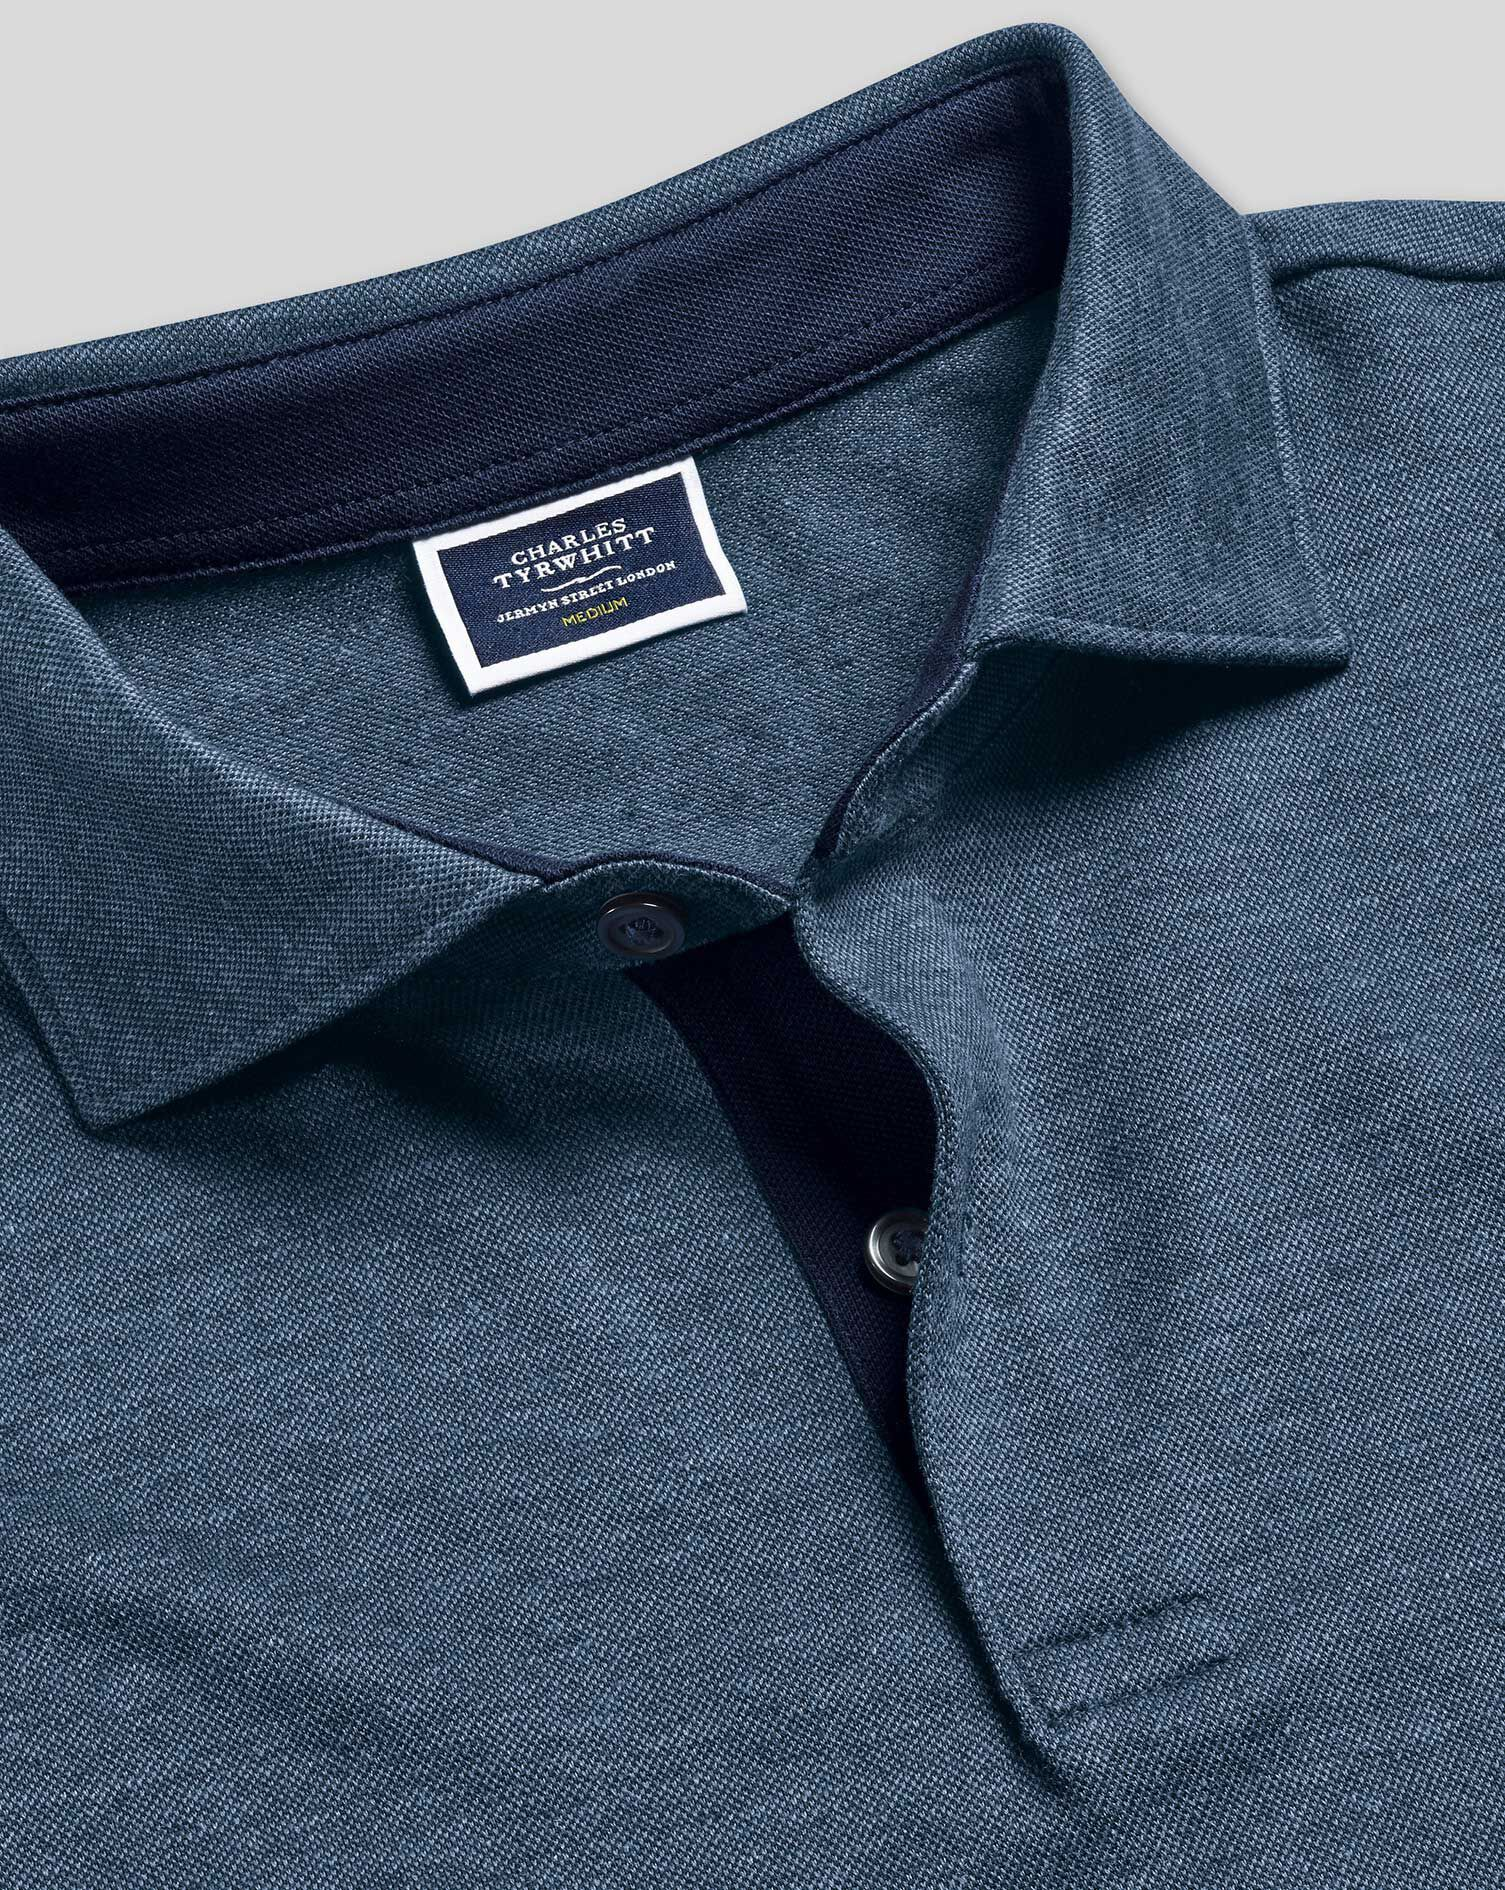 Men's Polos & t-shirts | Charles Tyrwhitt